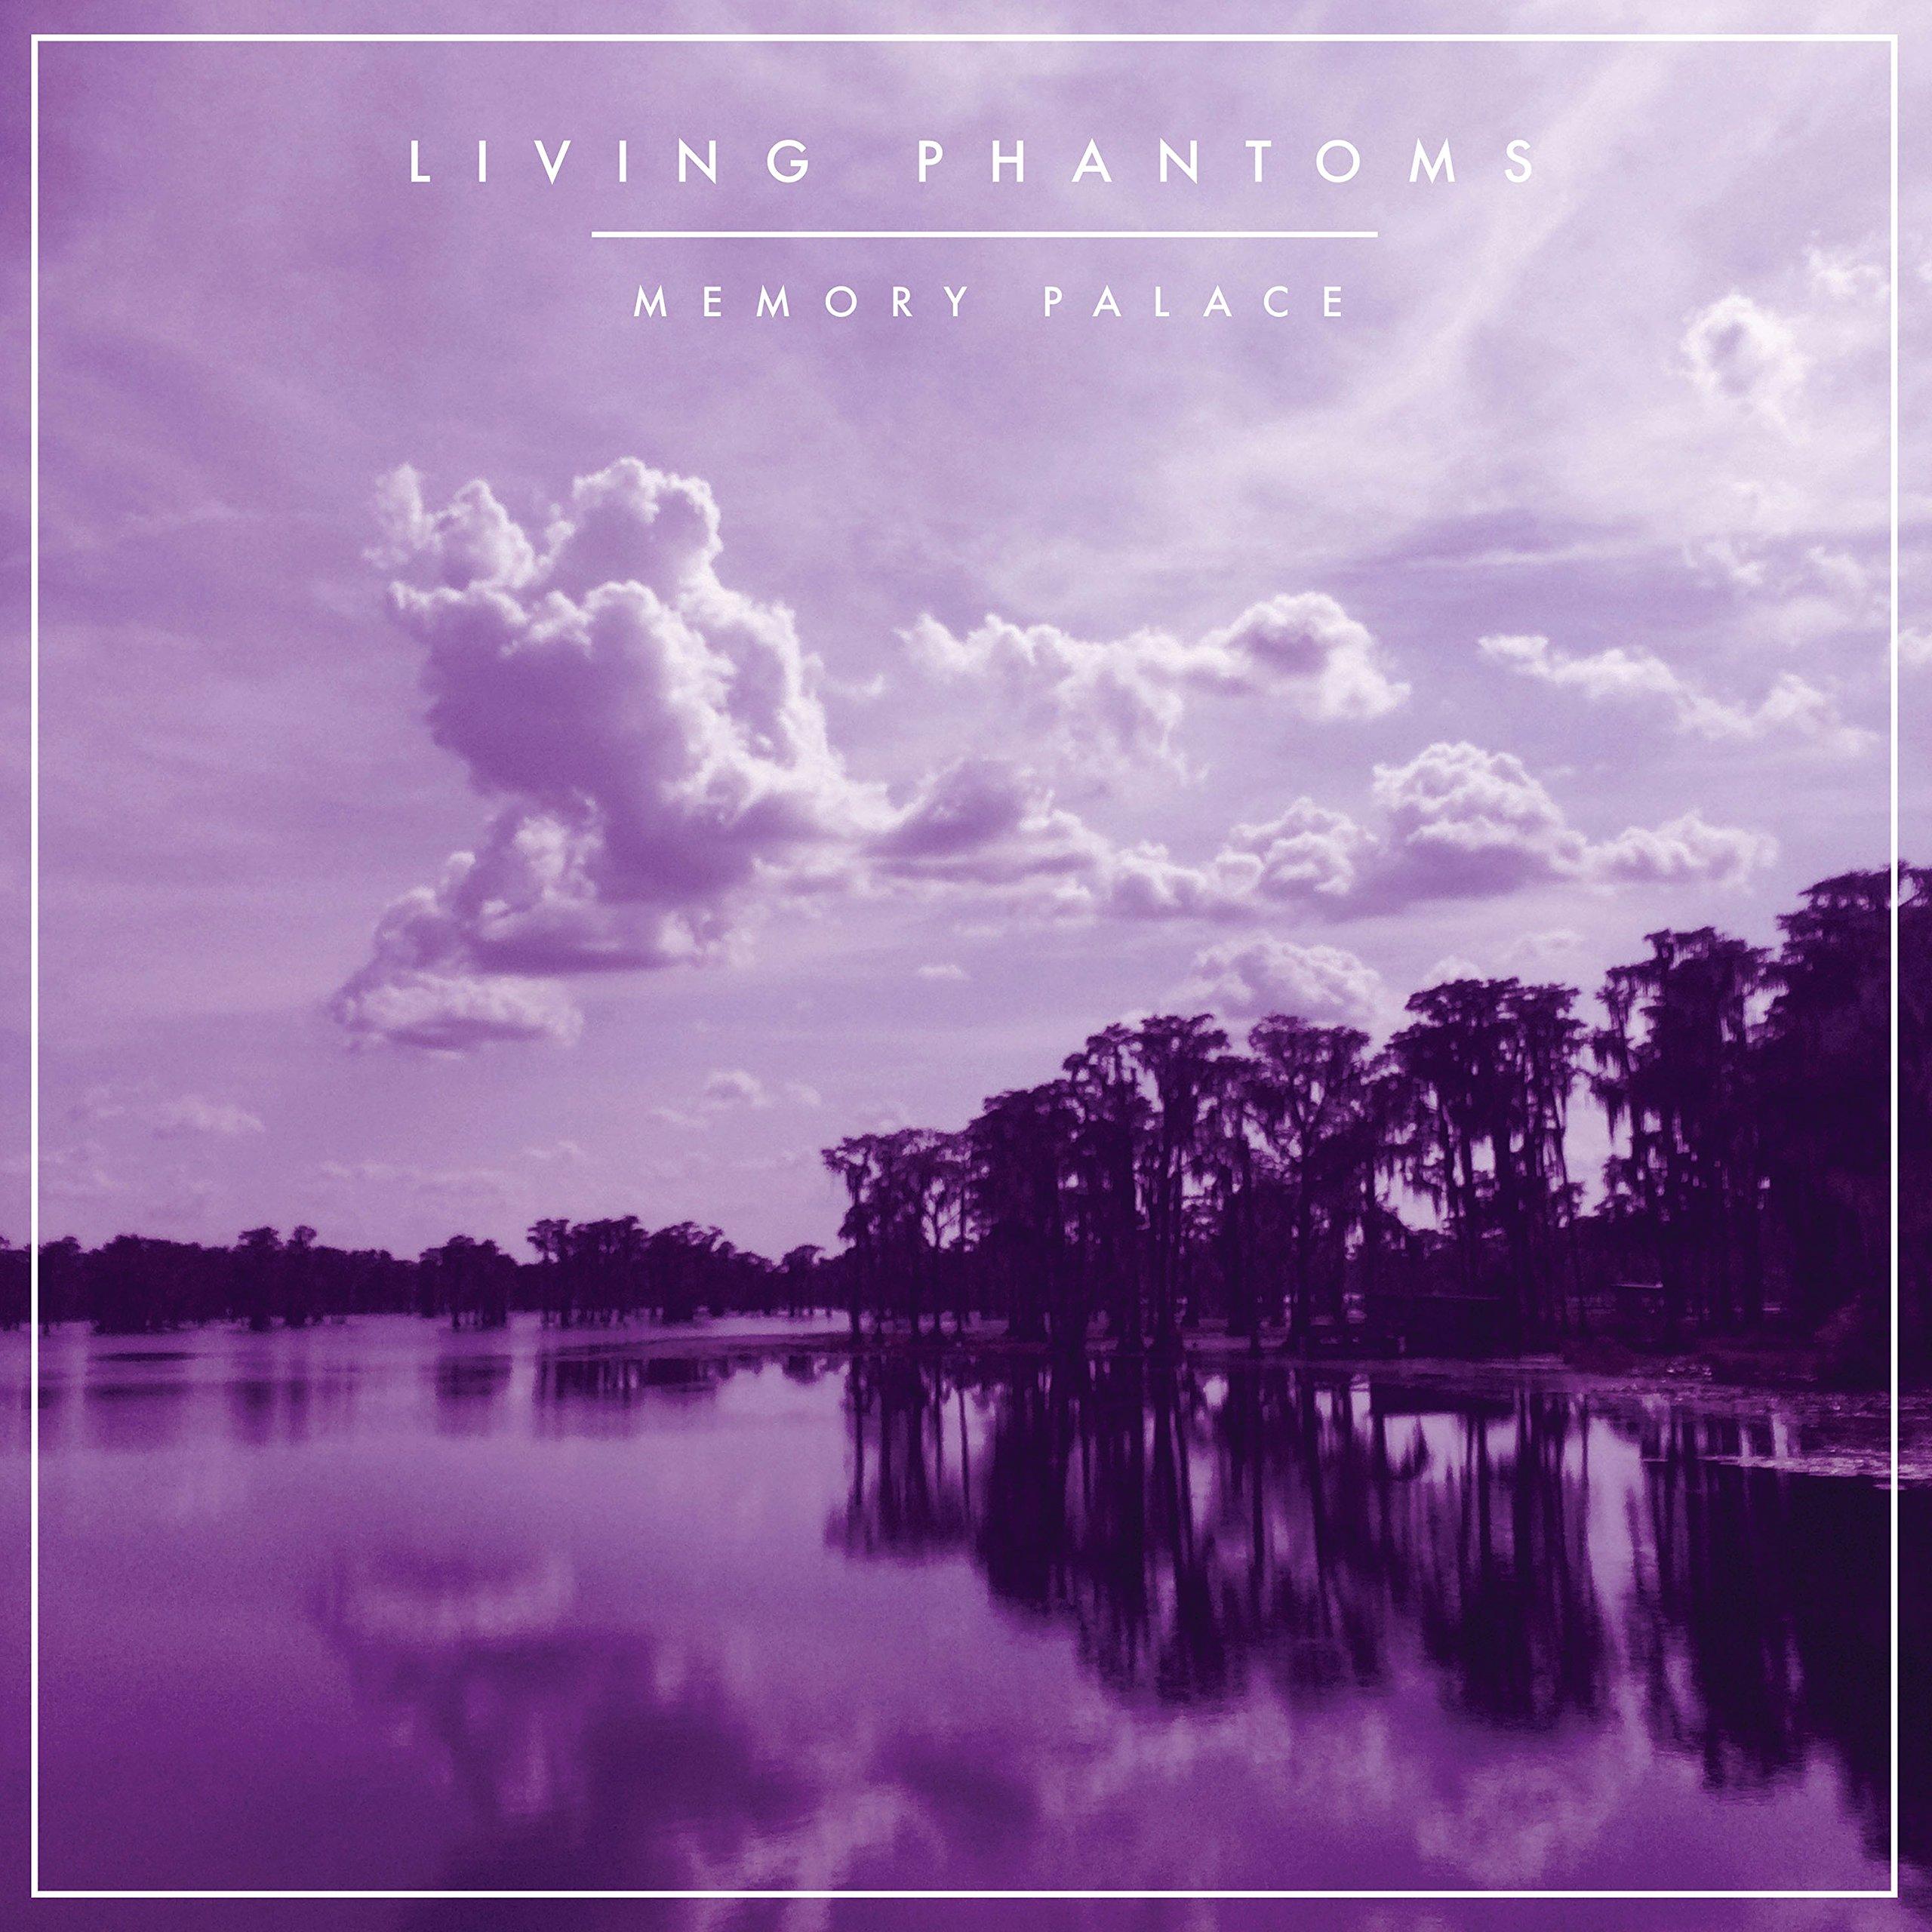 Living Phantoms - Memory Palace (CD)